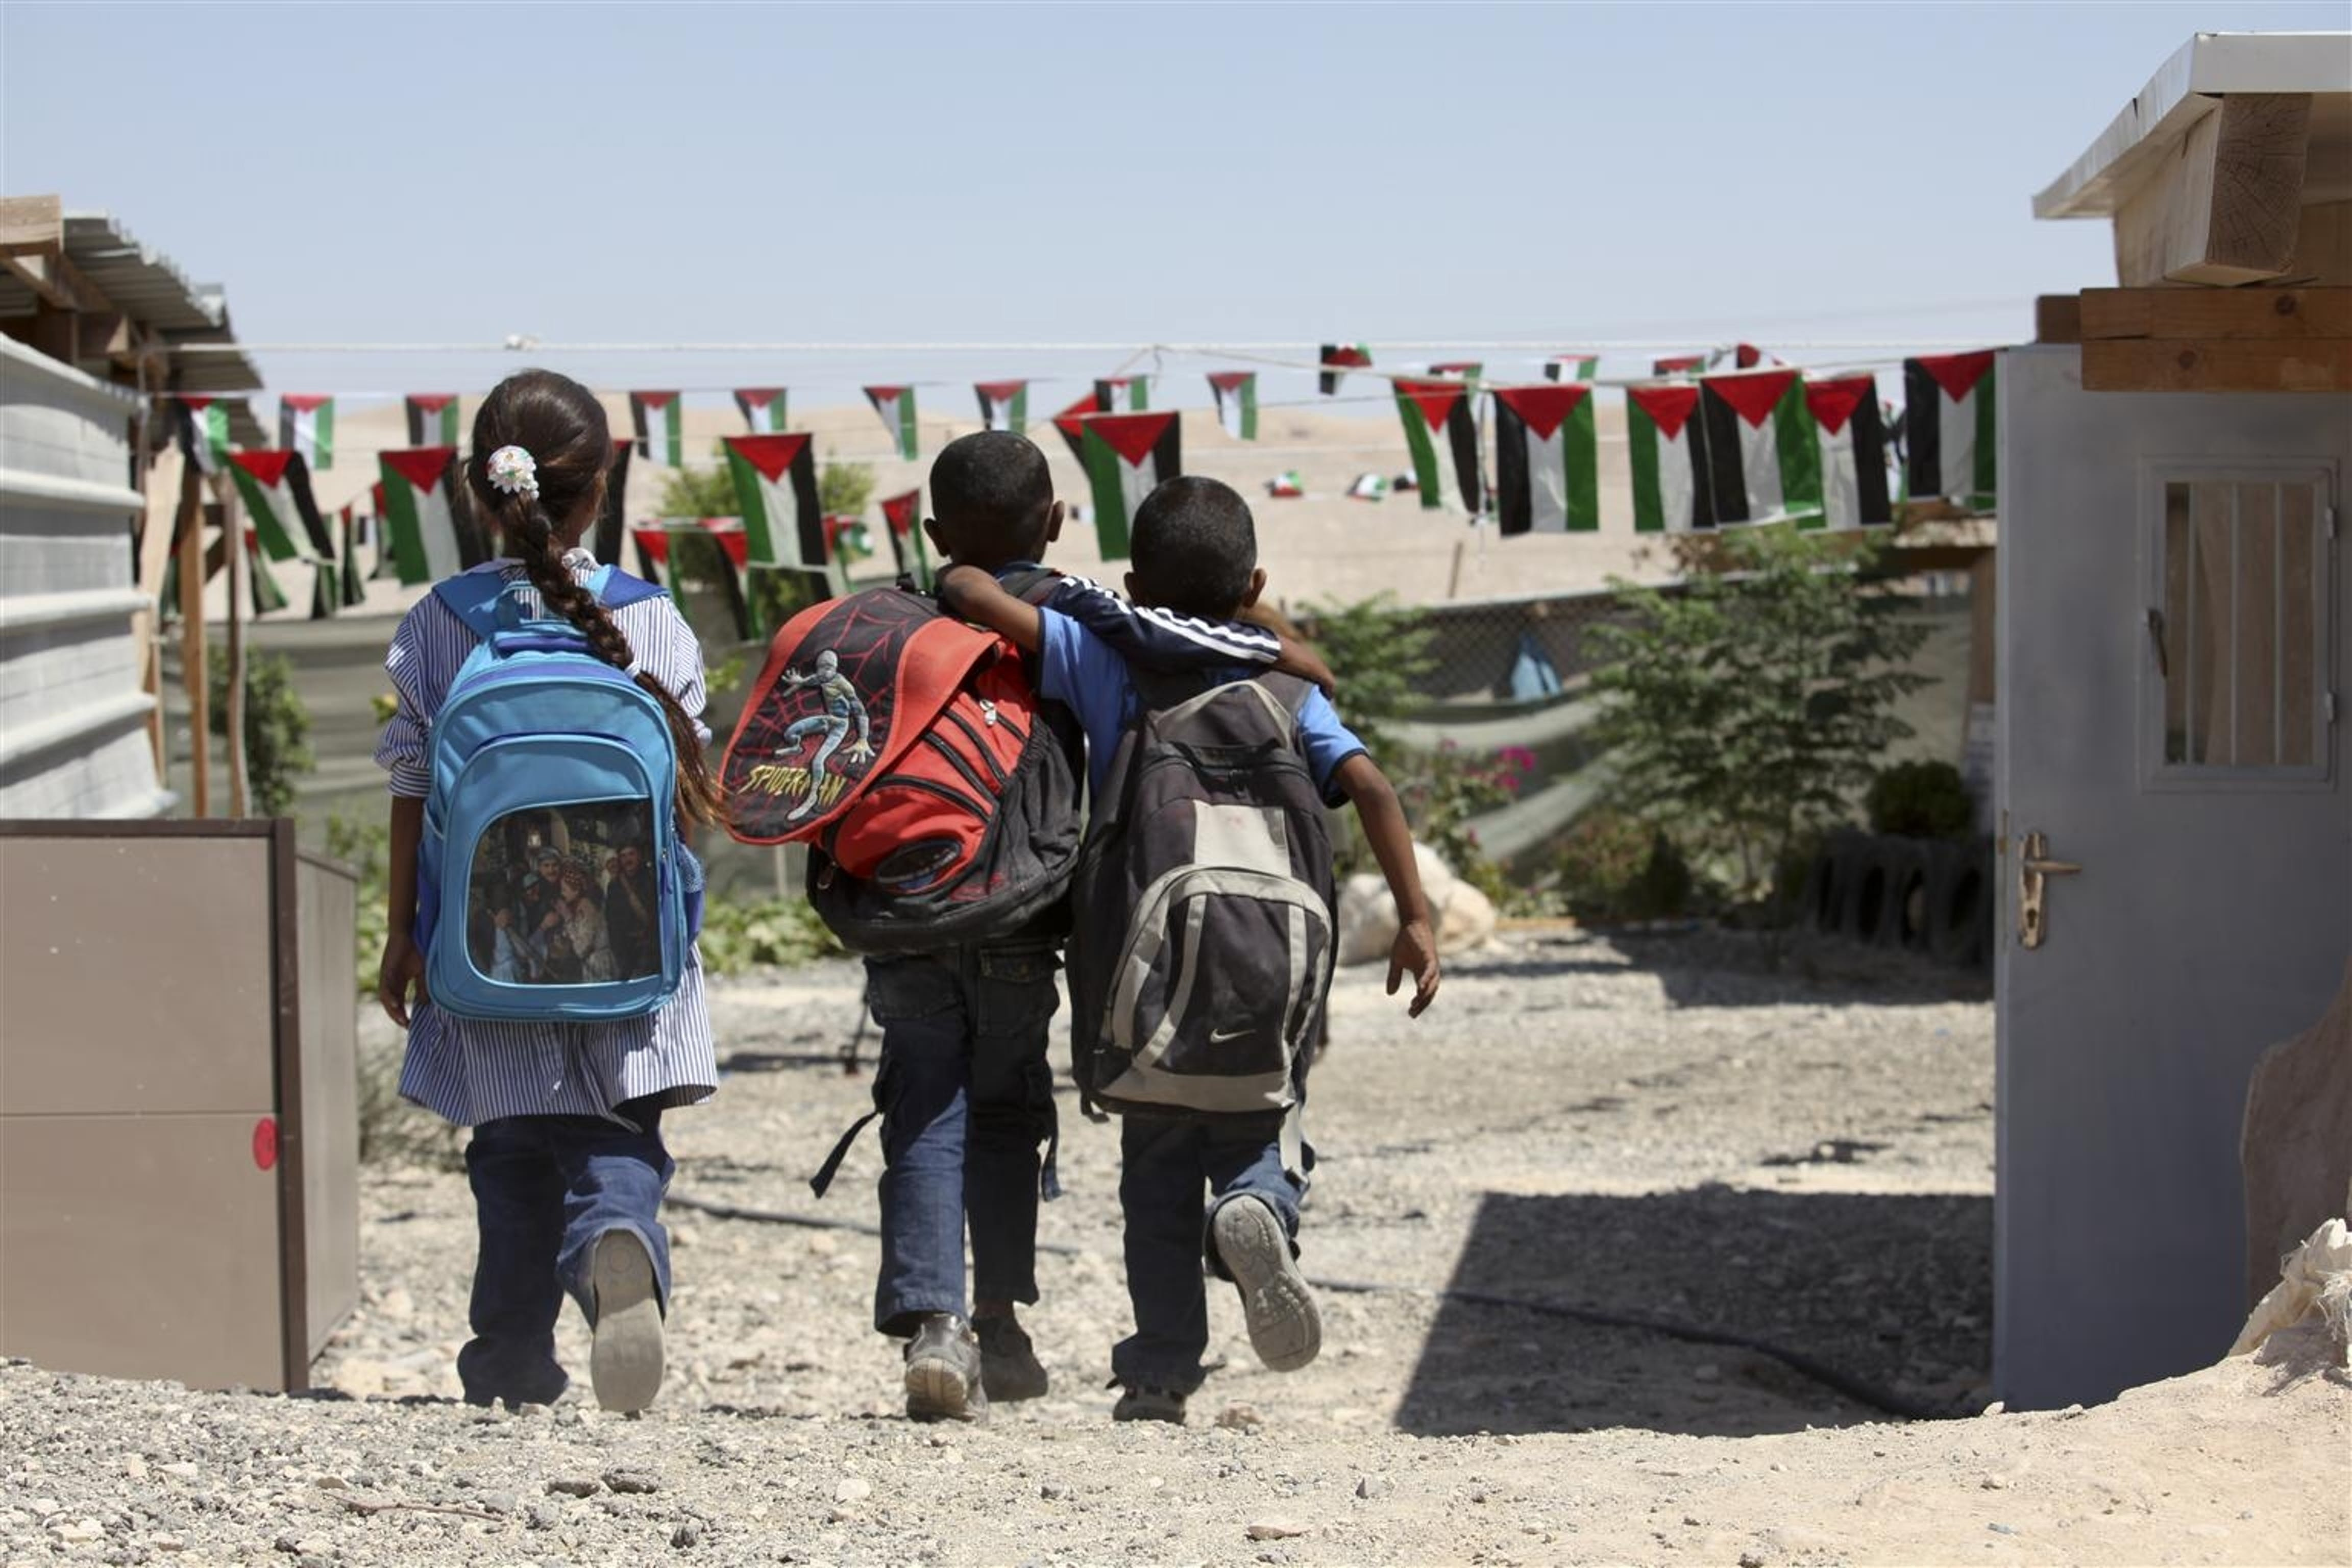 © UNICEF/NYHQ2010-1801/Izhiman